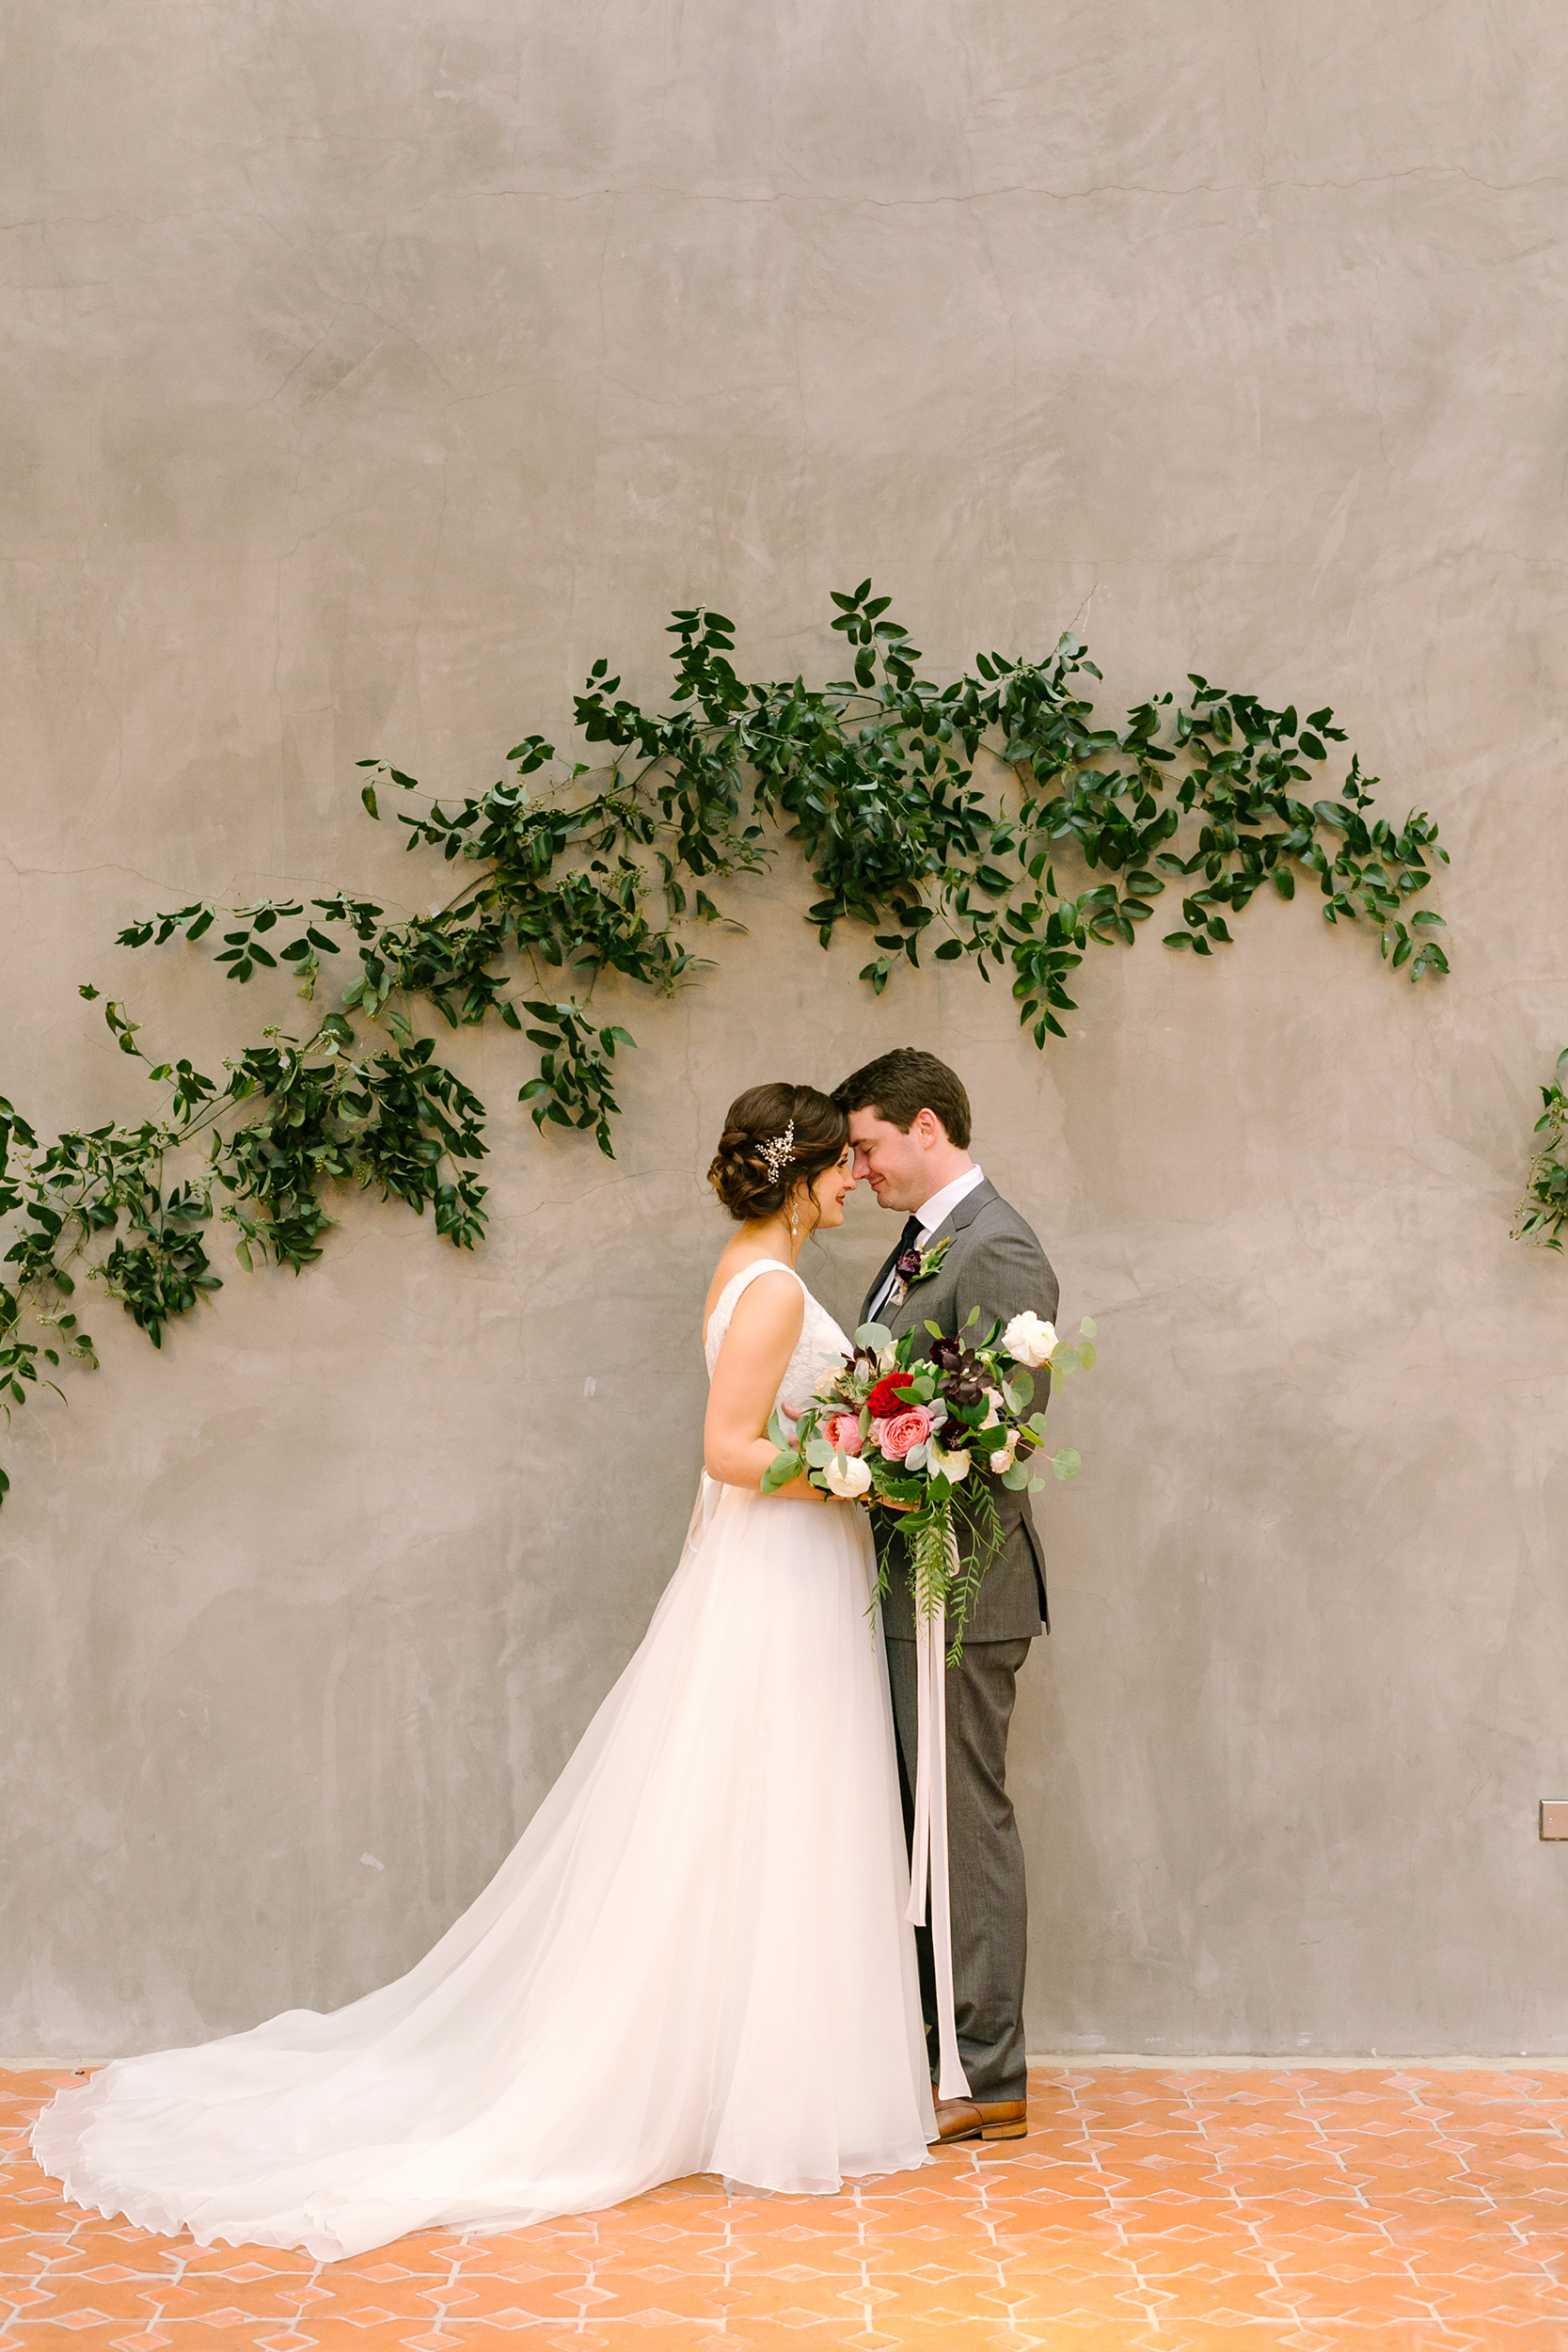 Austin_Wedding_Photographer_Kimberly_Brooke_Photographic_081.jpg